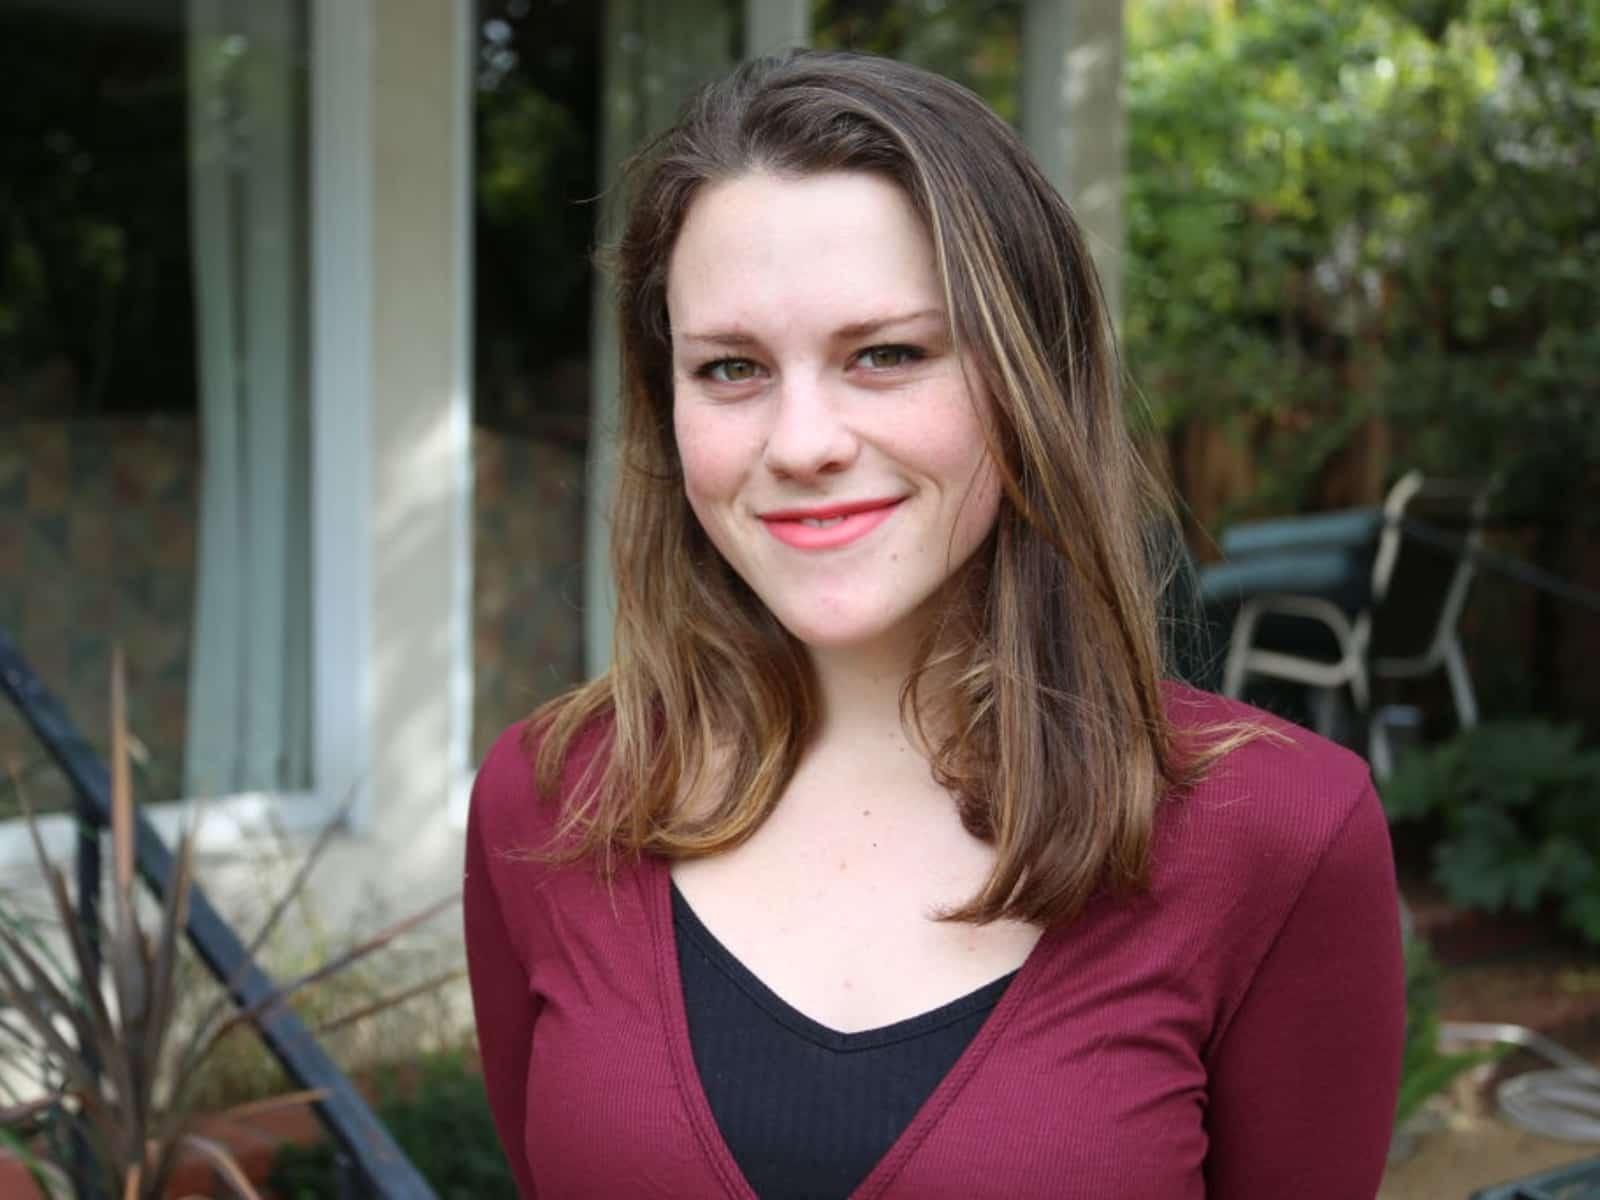 Anna from Berkeley, California, United States